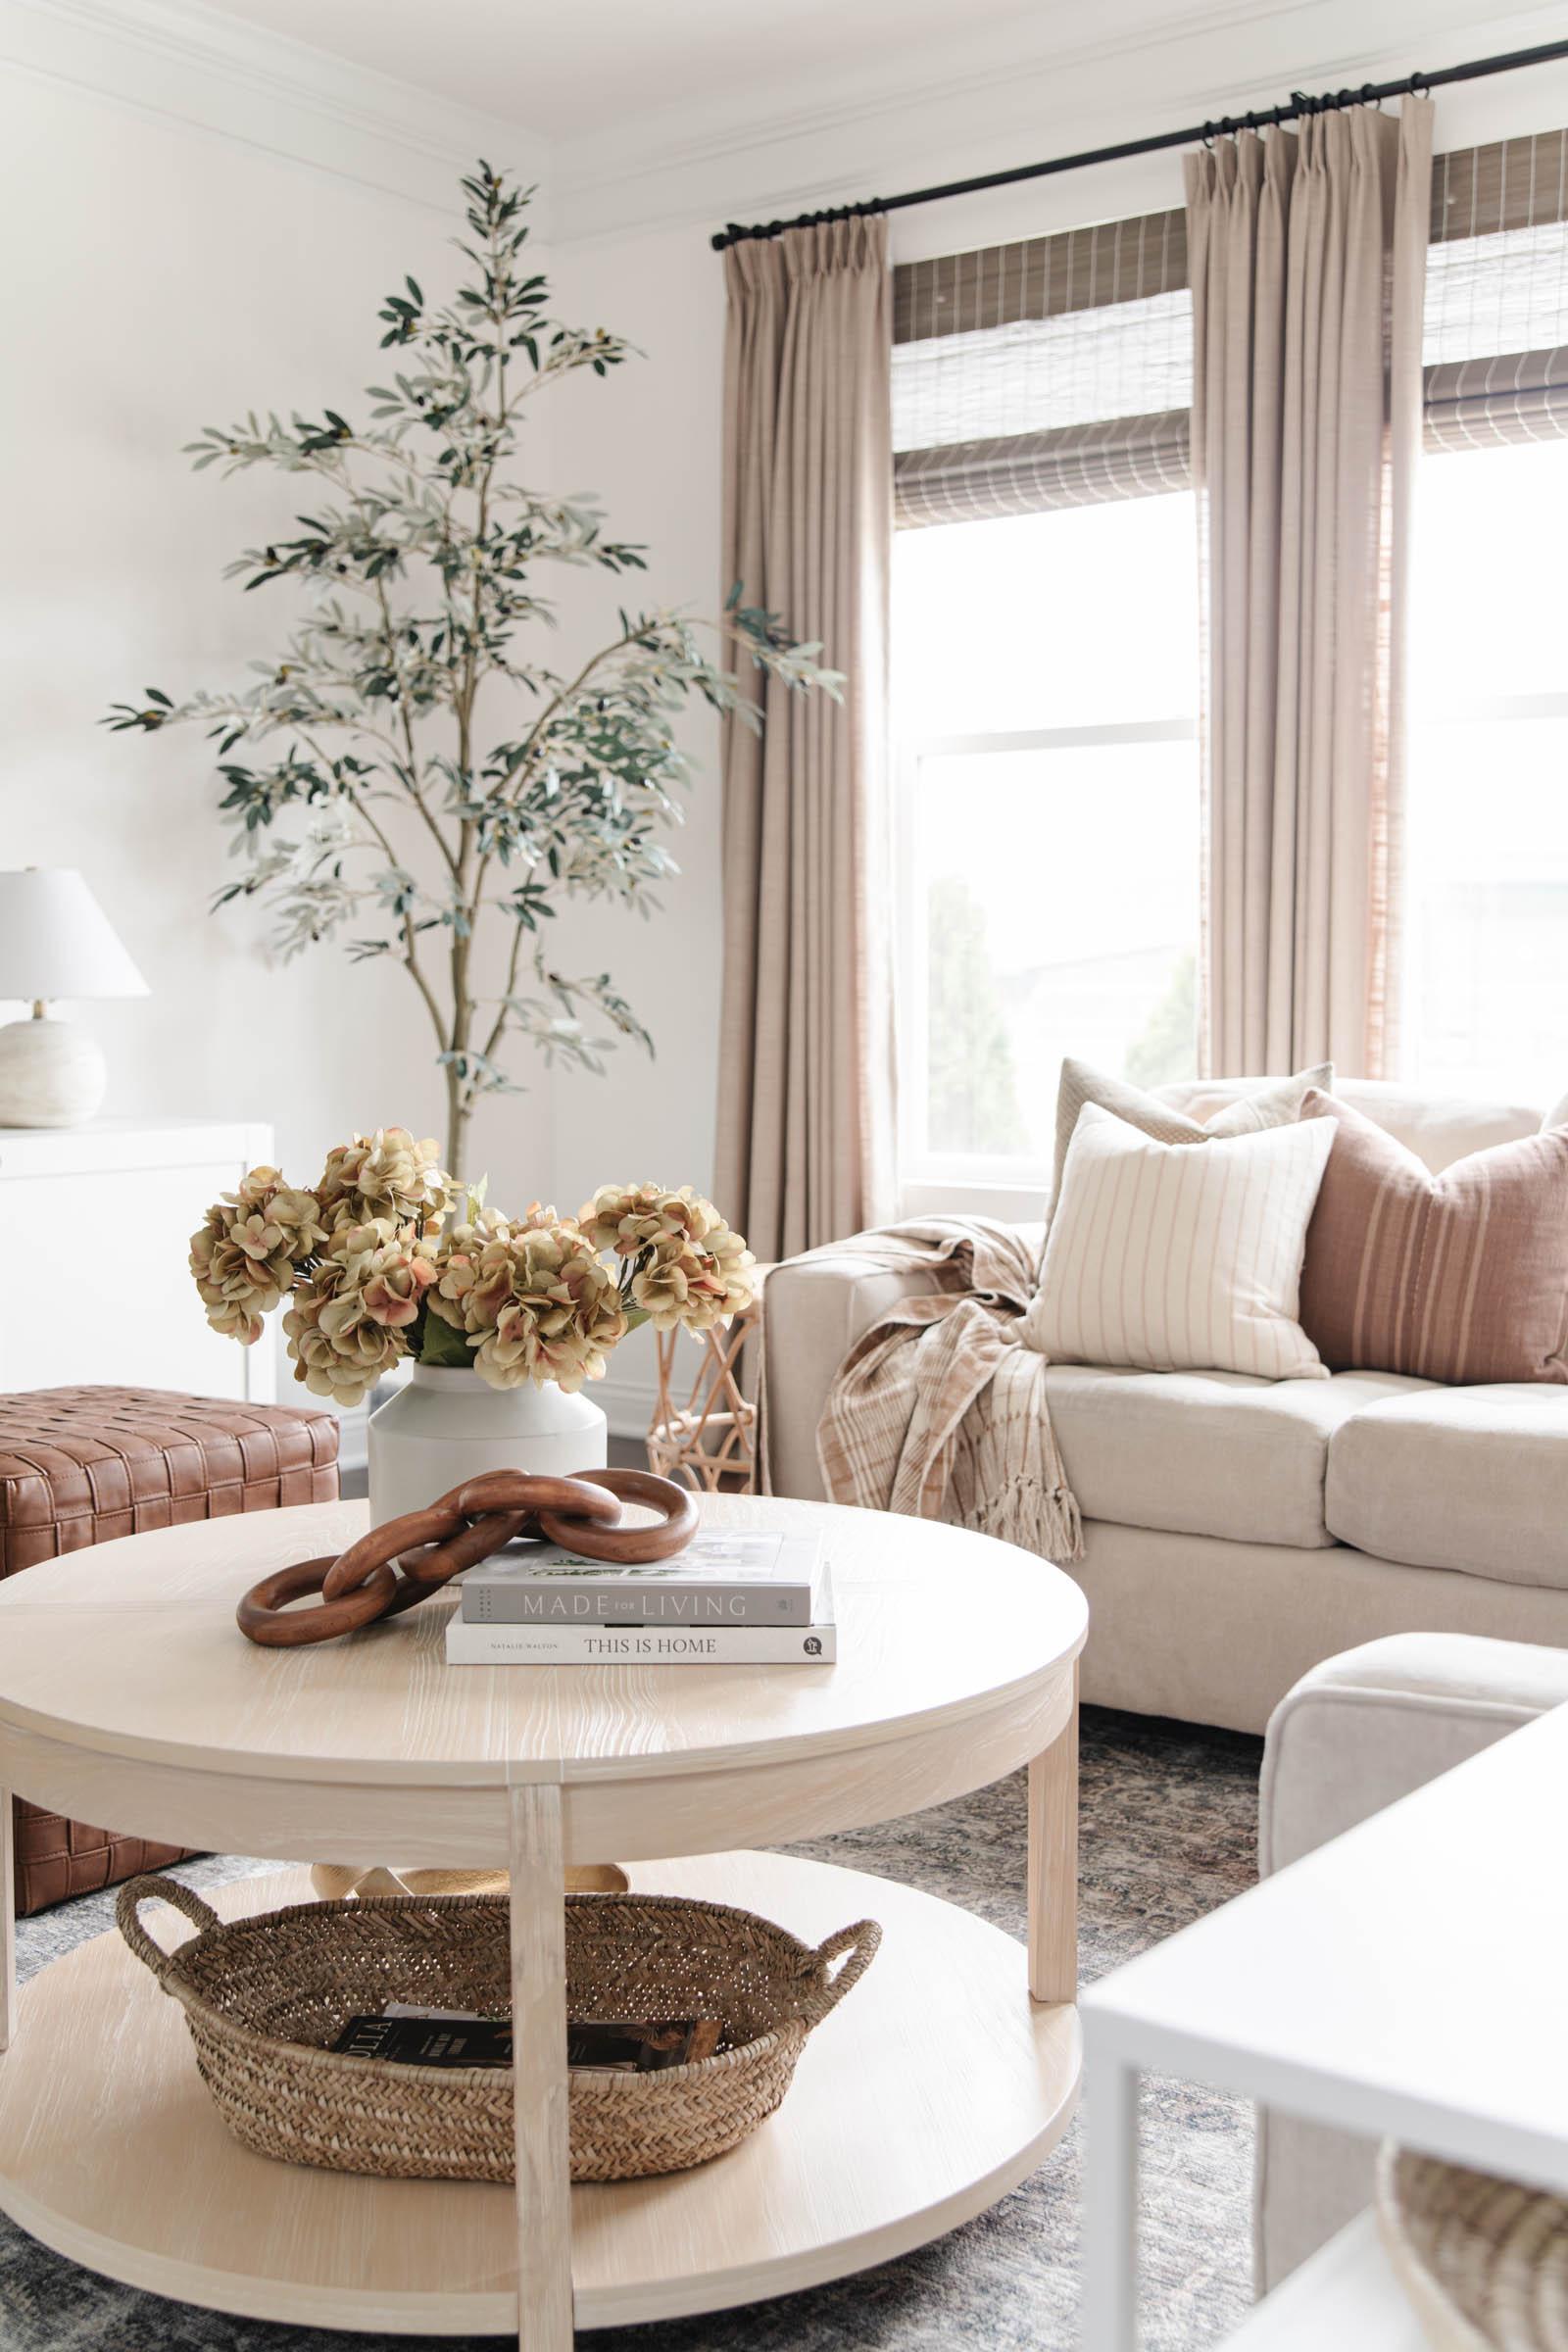 porto round whitewashed wood coffee table, Studio McGee decorative teak wood chain figurine, faux hydrangeas, mauve pillow, basket for magazines